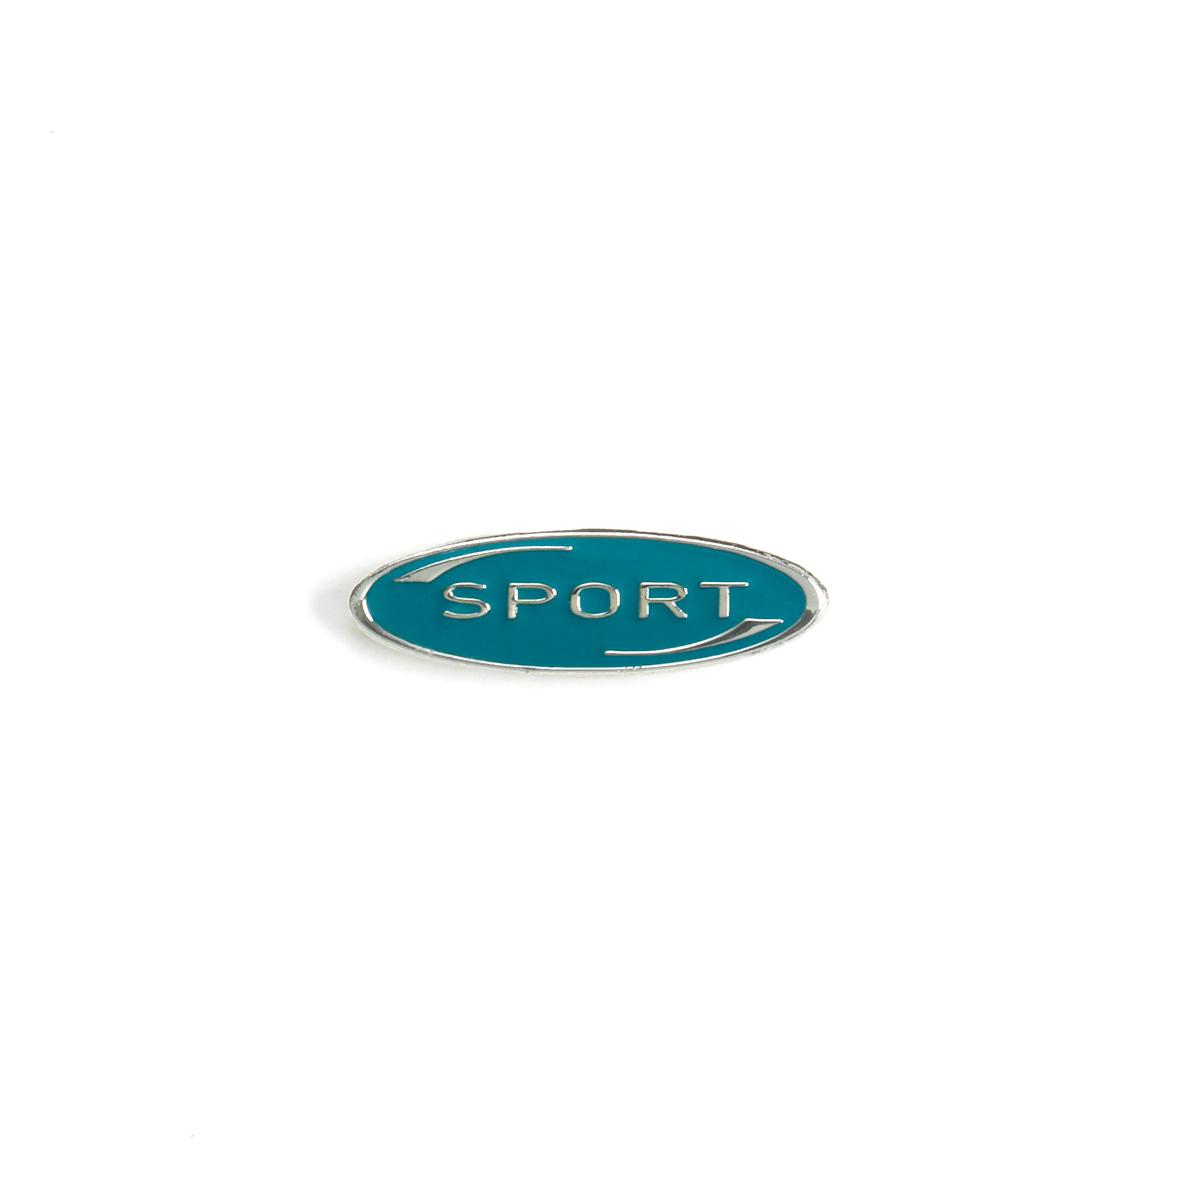 AIRMKT eCom PN 26368W-05 Trailer Badge Pins 3 Qtr inch-Sport 42451 WEB